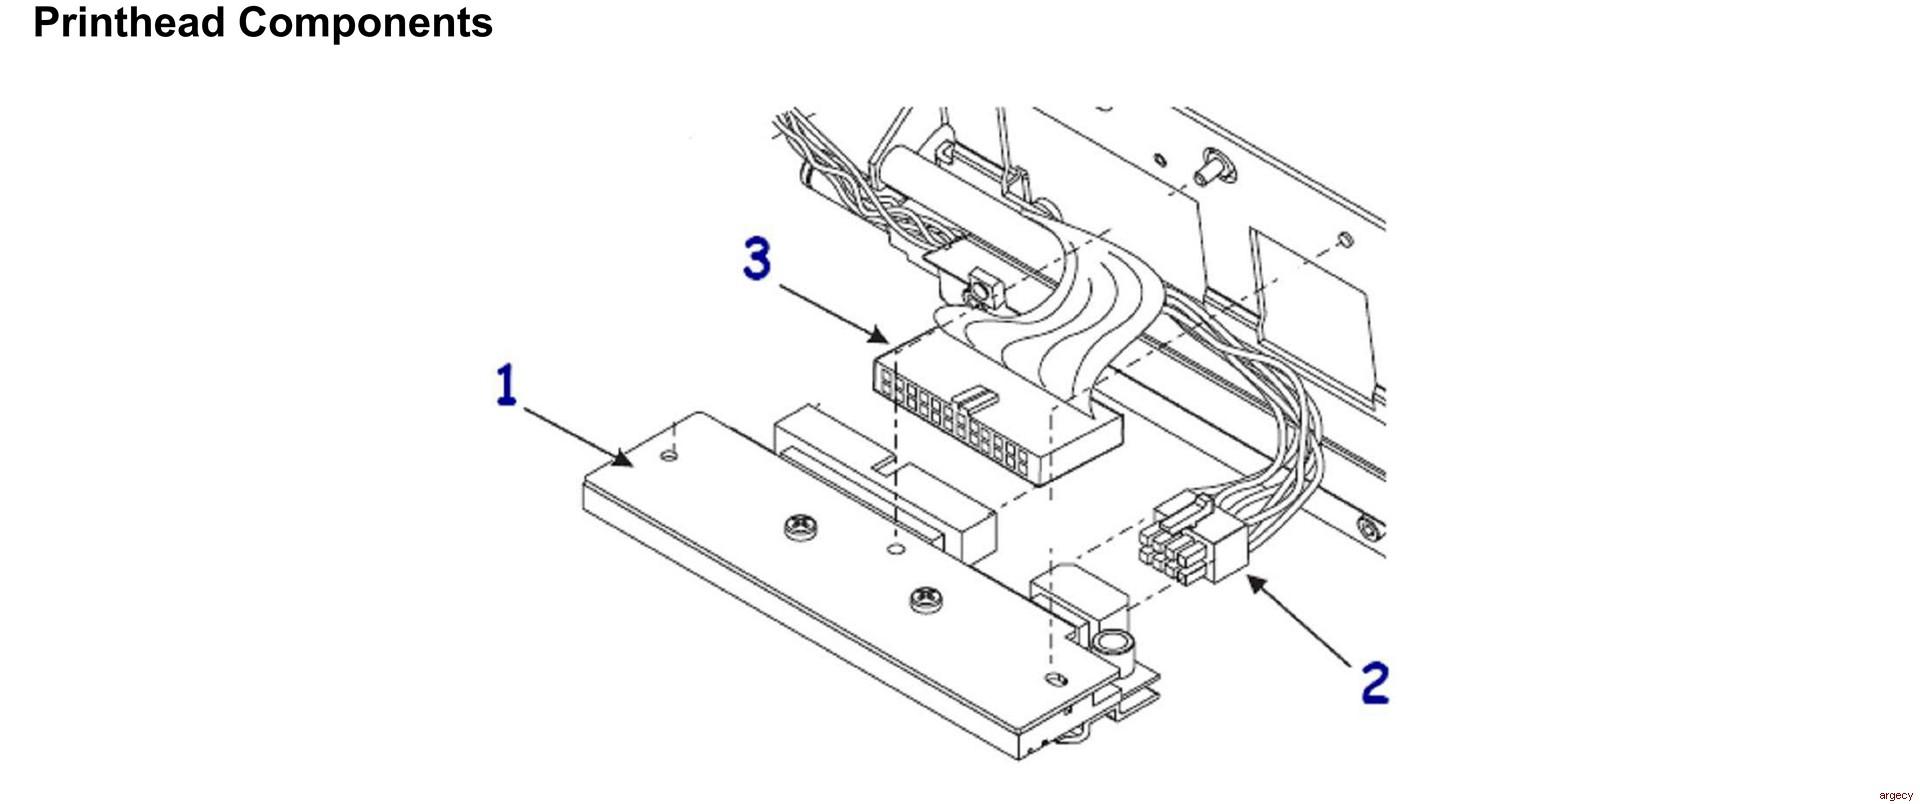 http://www.argecy.com/images/90Xi3Plus_96Xi3Plus_140Xi3Plus_170Xi3Plus_220Xi3Plus_Parts-4_cr.jpg